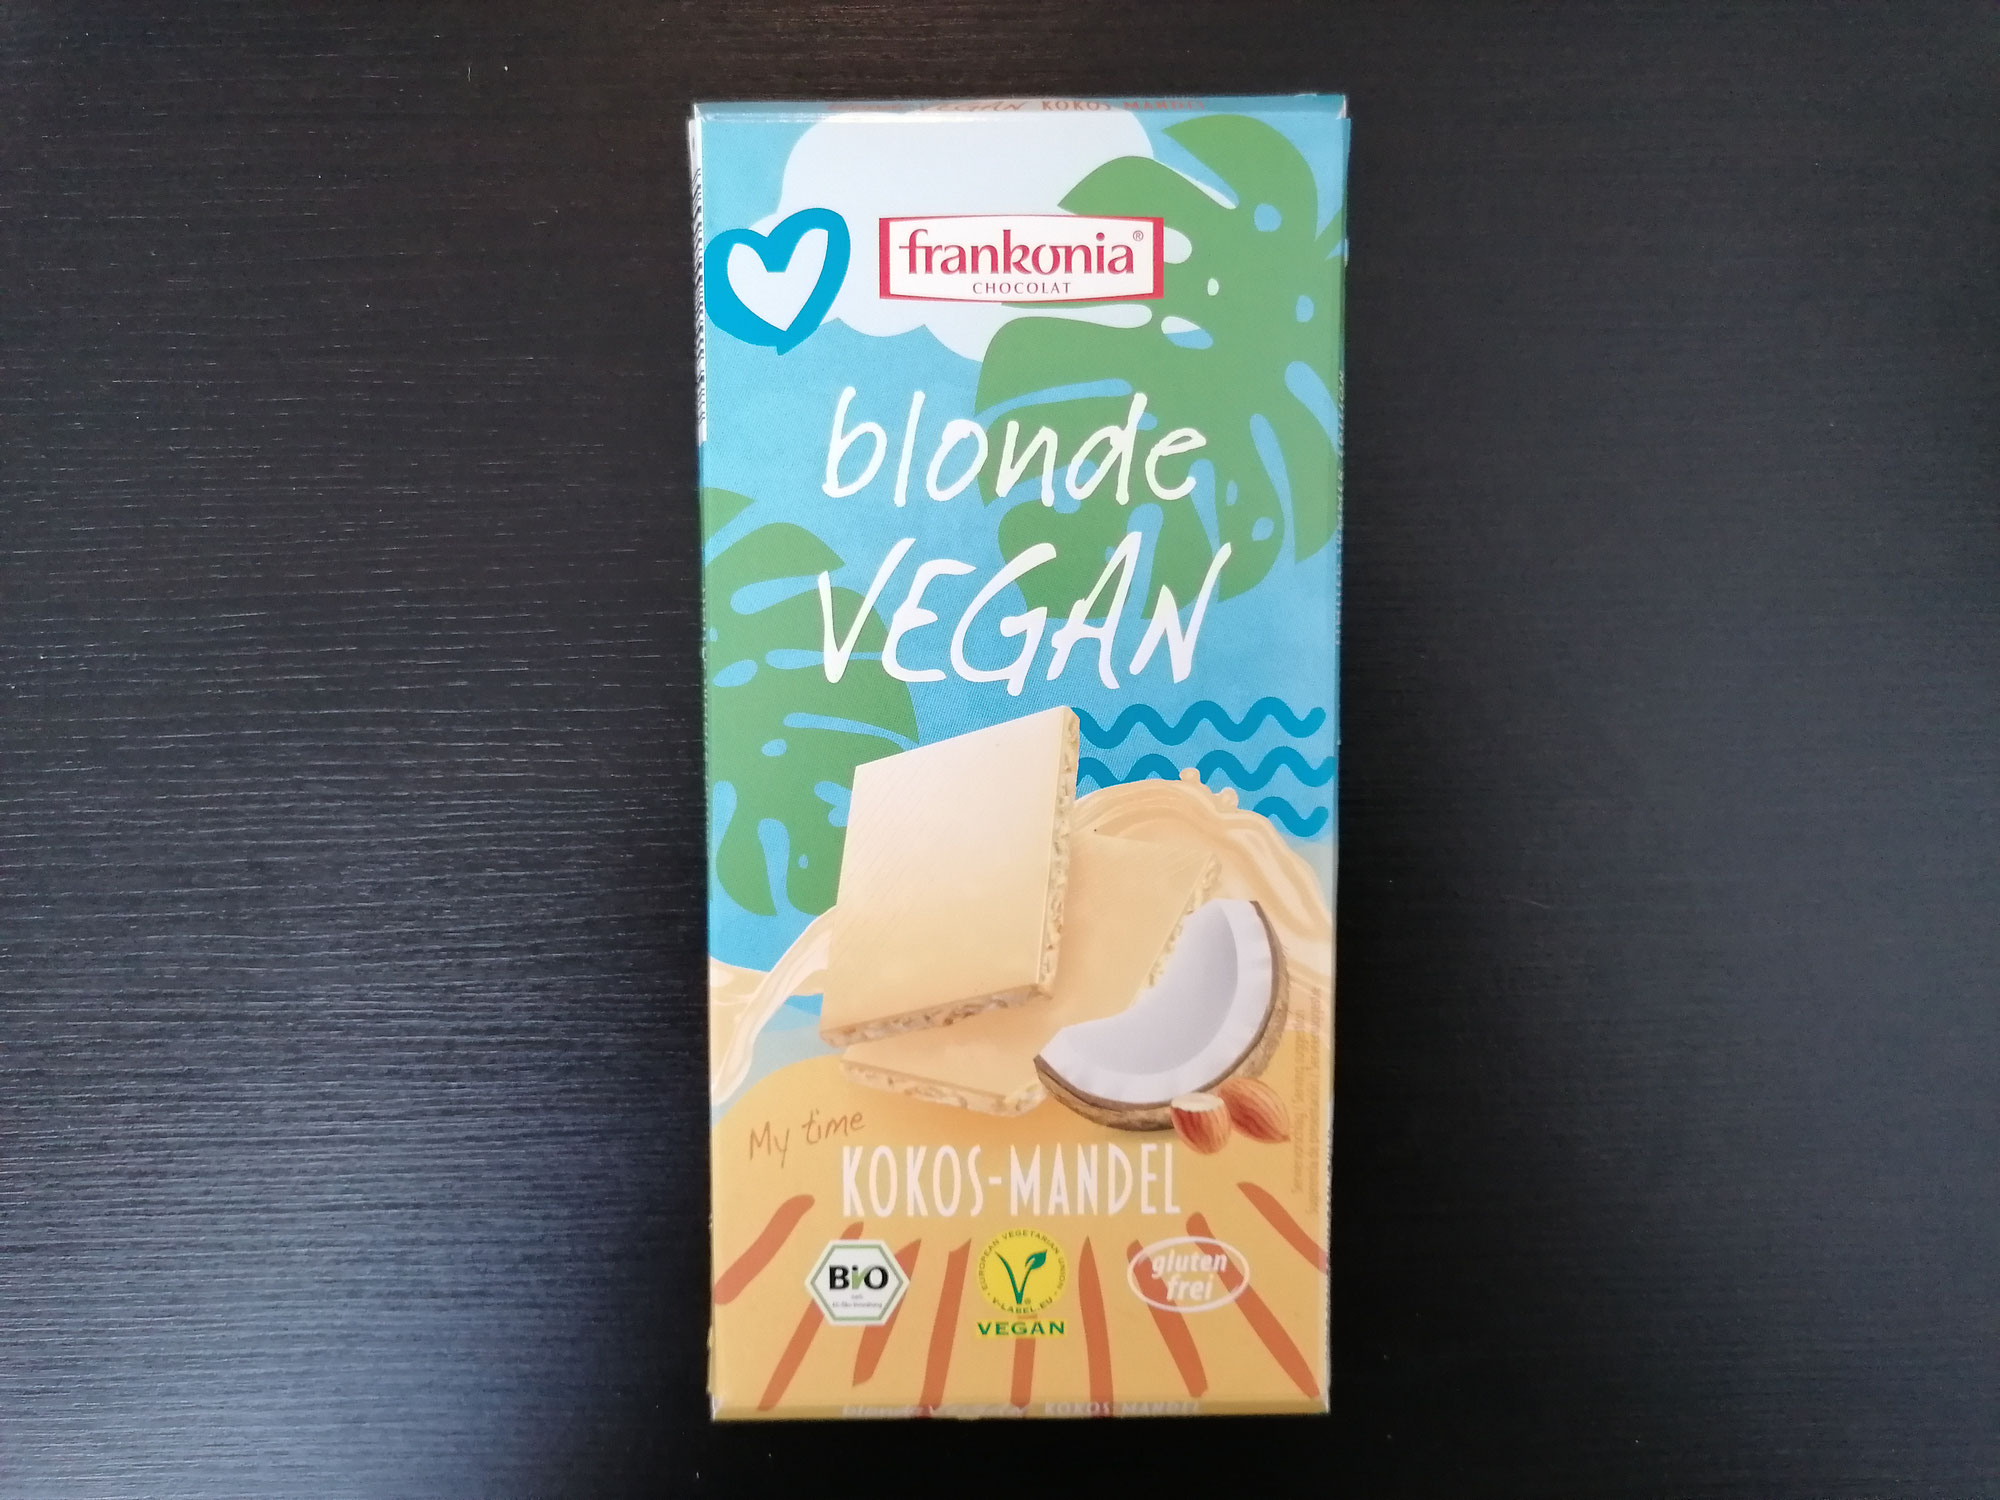 Frankonia blonde Vegan-Kokos-Mandel